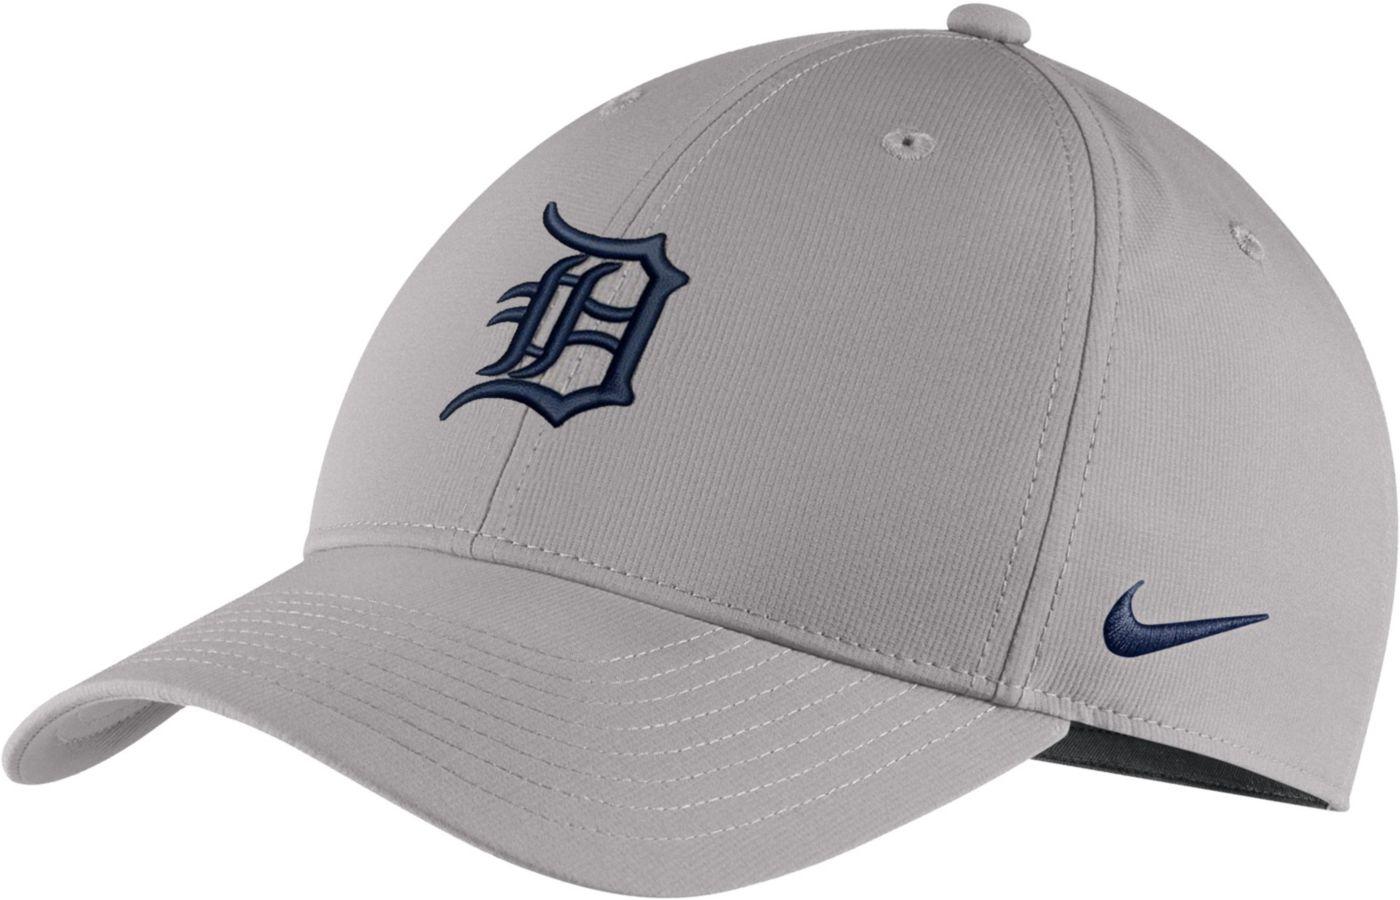 Nike Men's Detroit Tigers Dri-FIT Legacy 91 Adjustable Hat